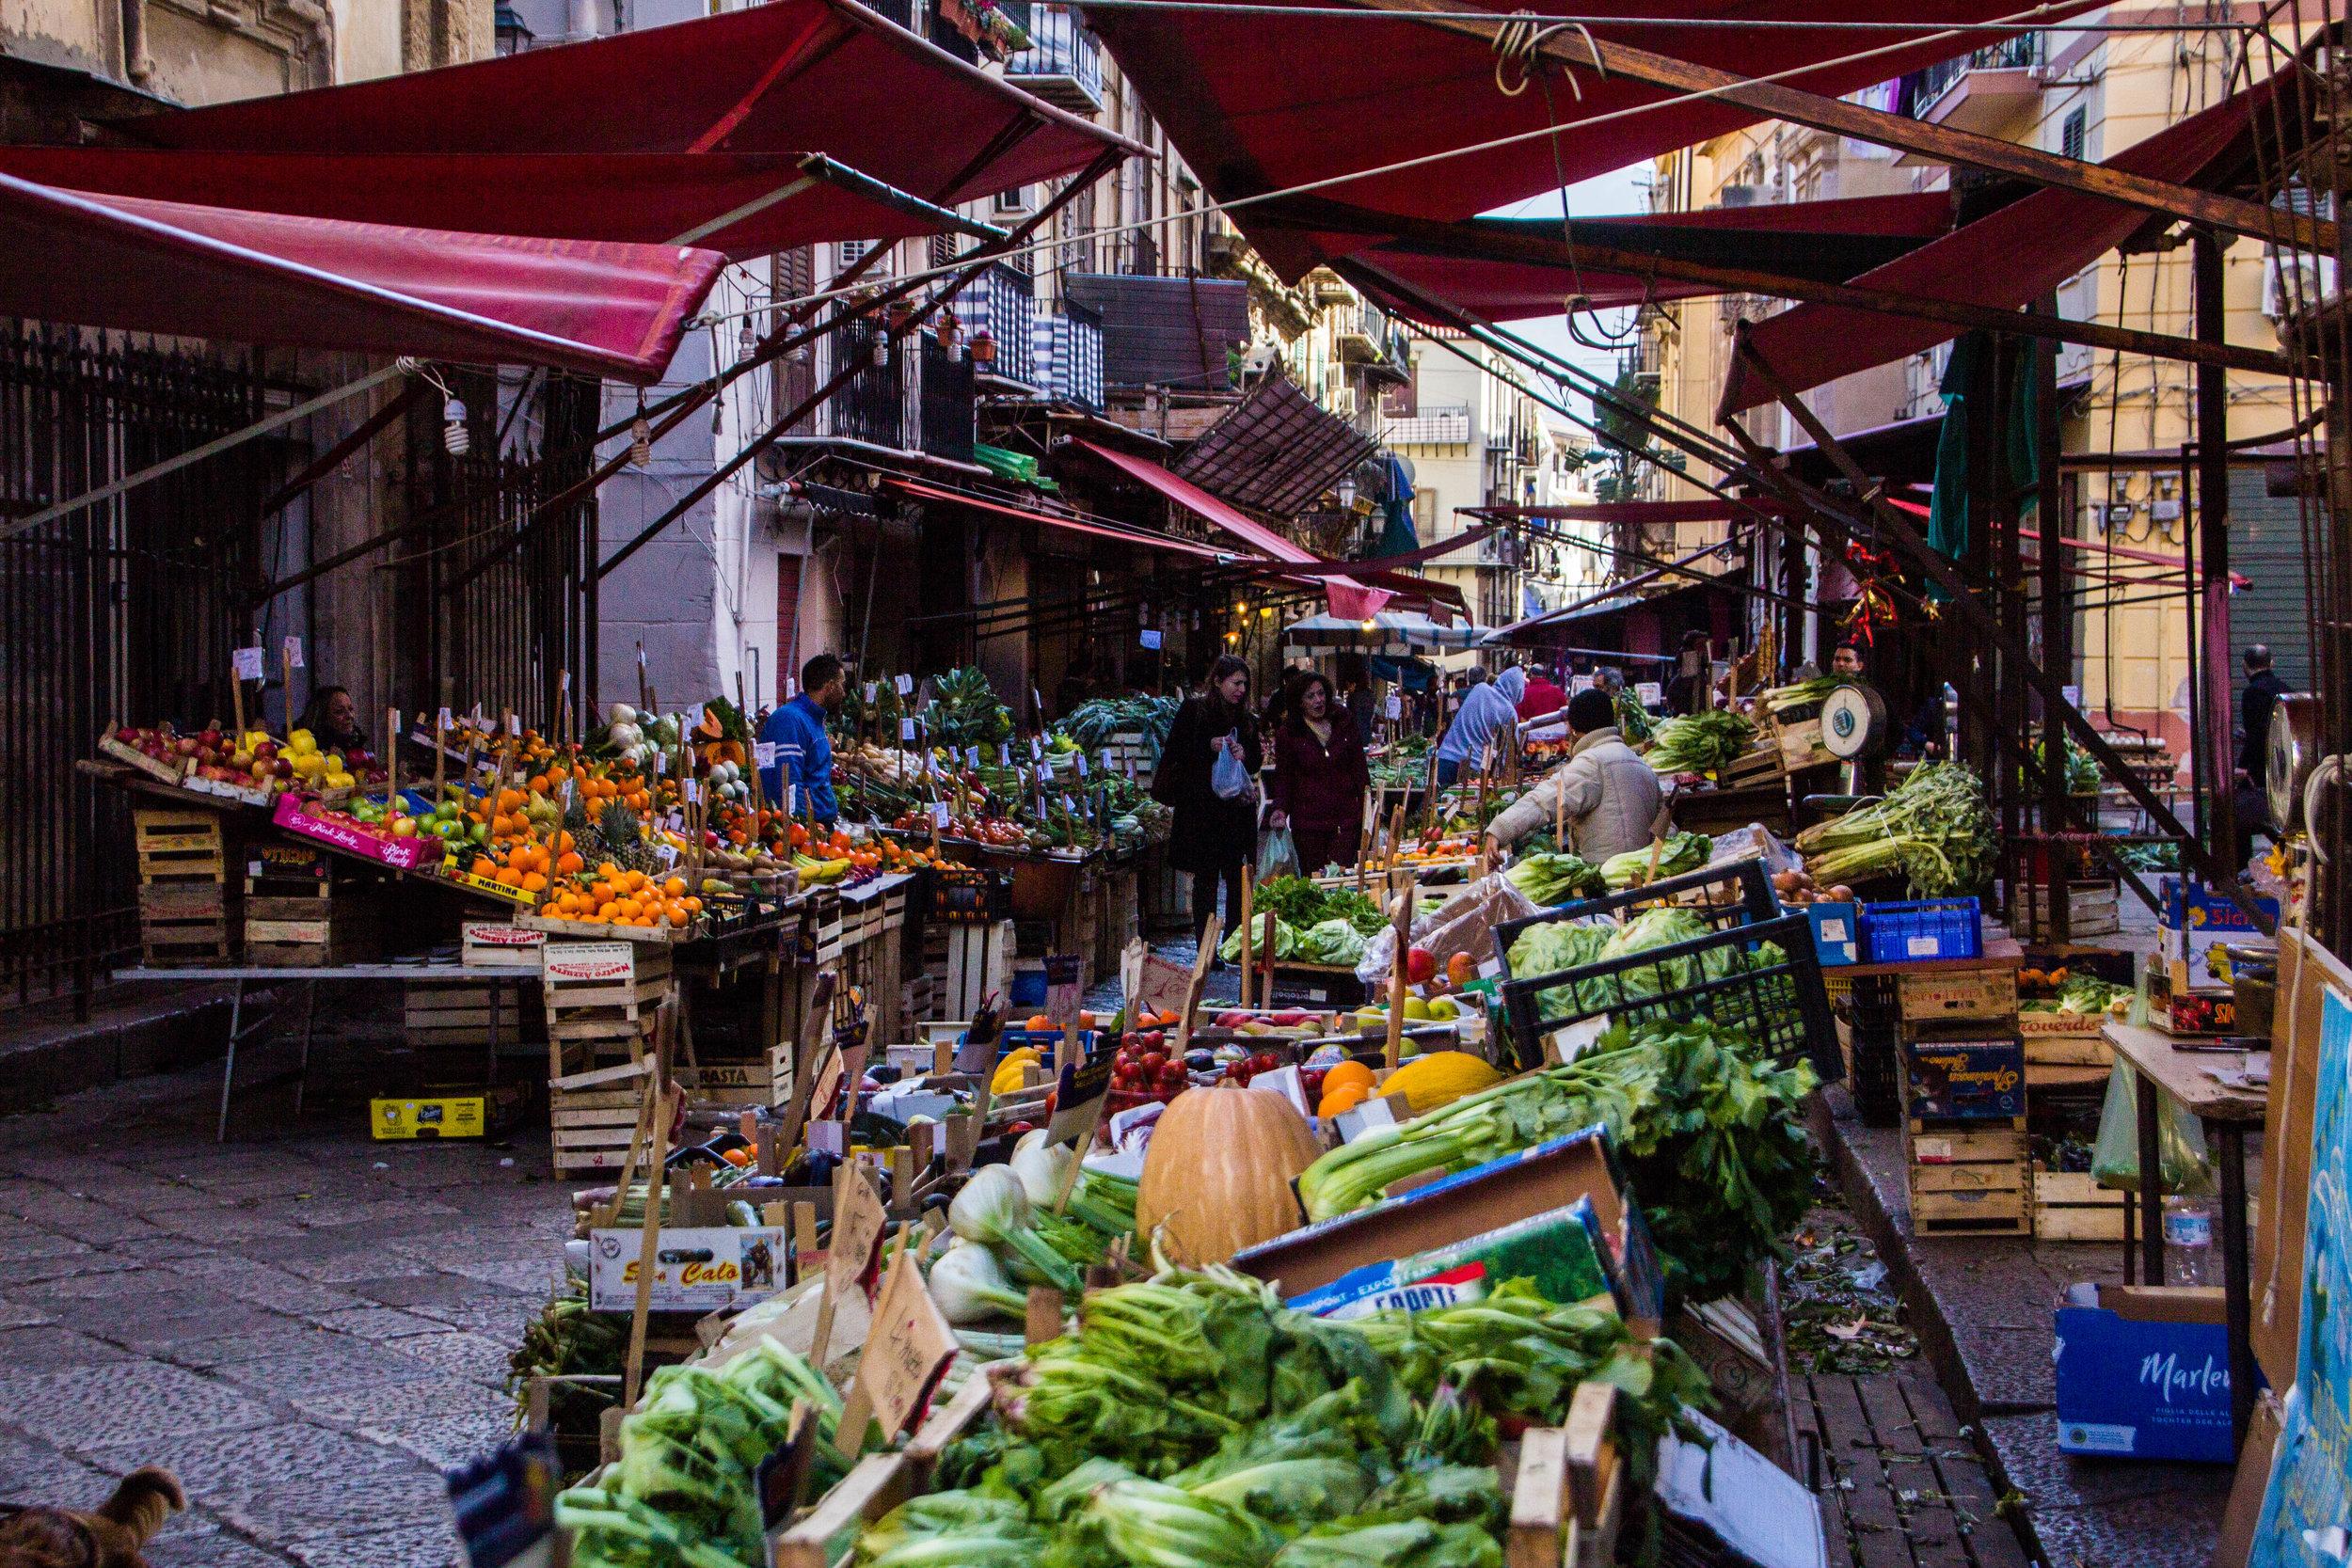 street-markets-palermo-sicily-10.jpg